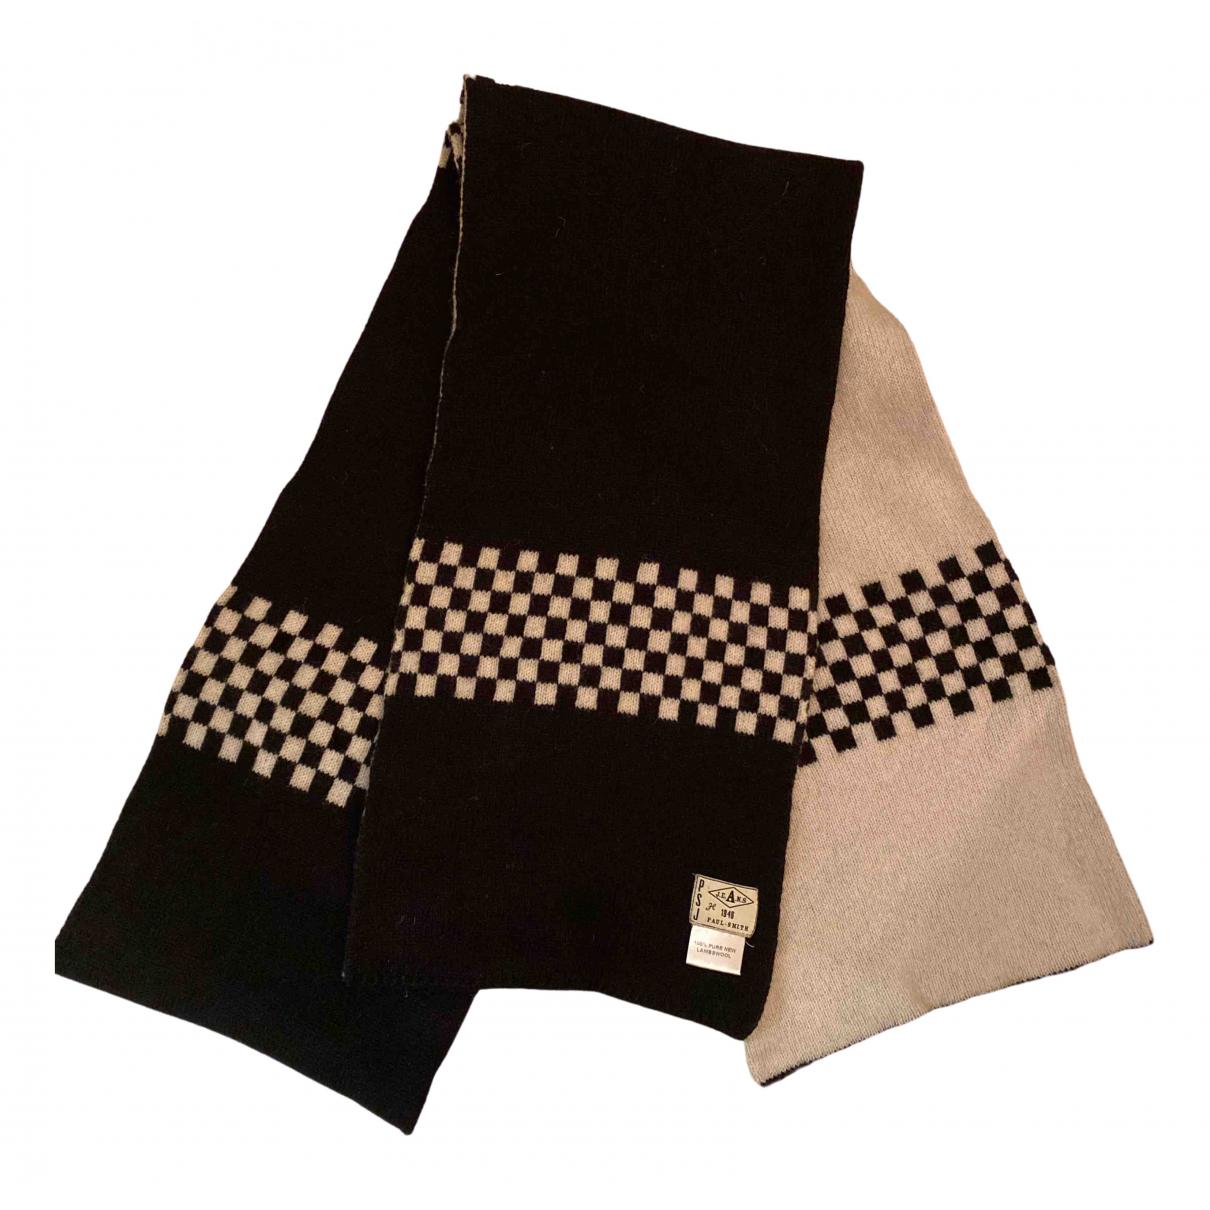 Paul Smith N Black Wool scarf & pocket squares for Men N